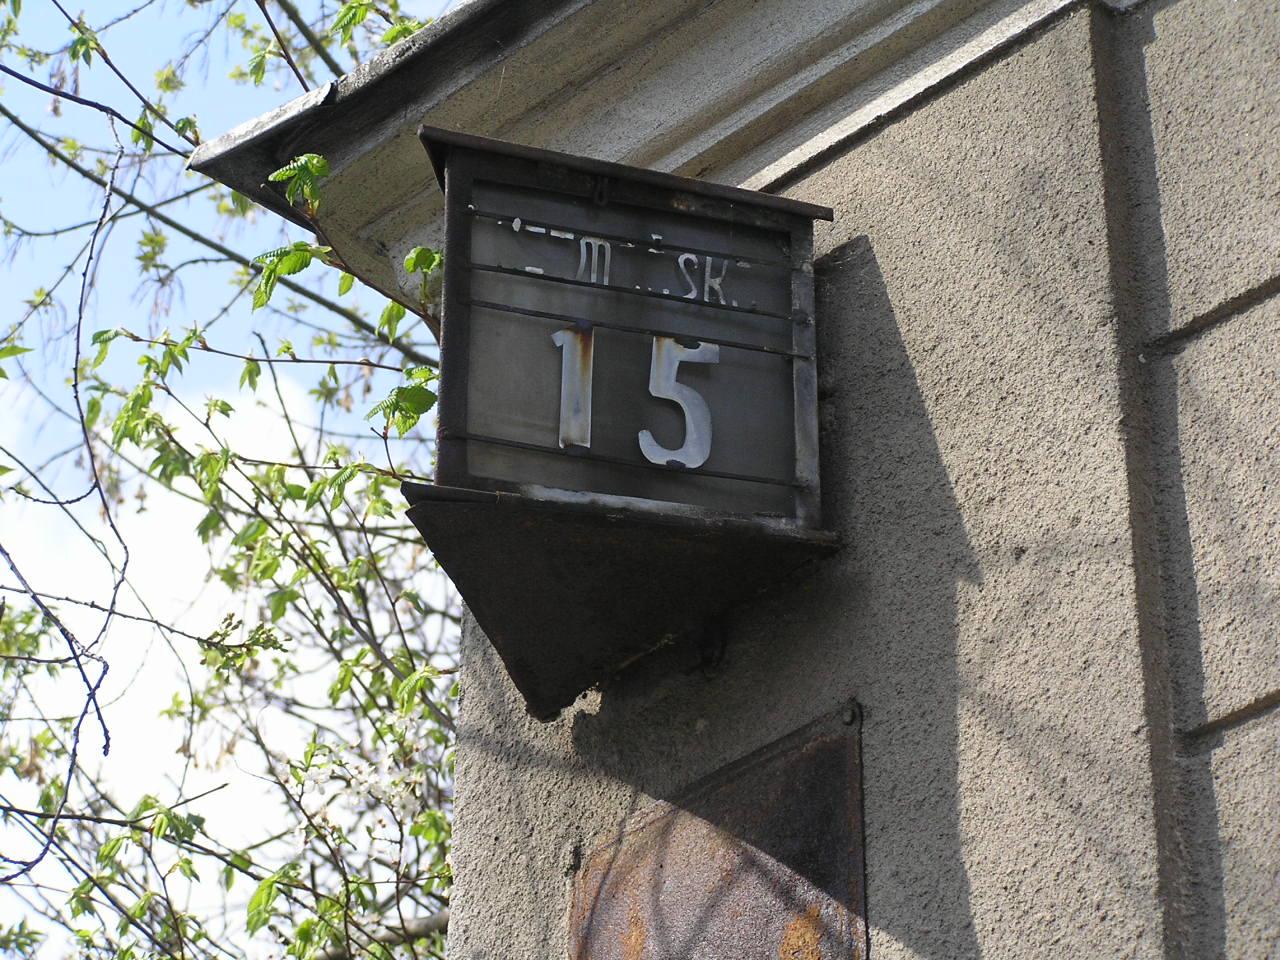 Latarenka adresowa - Hetmańska 15